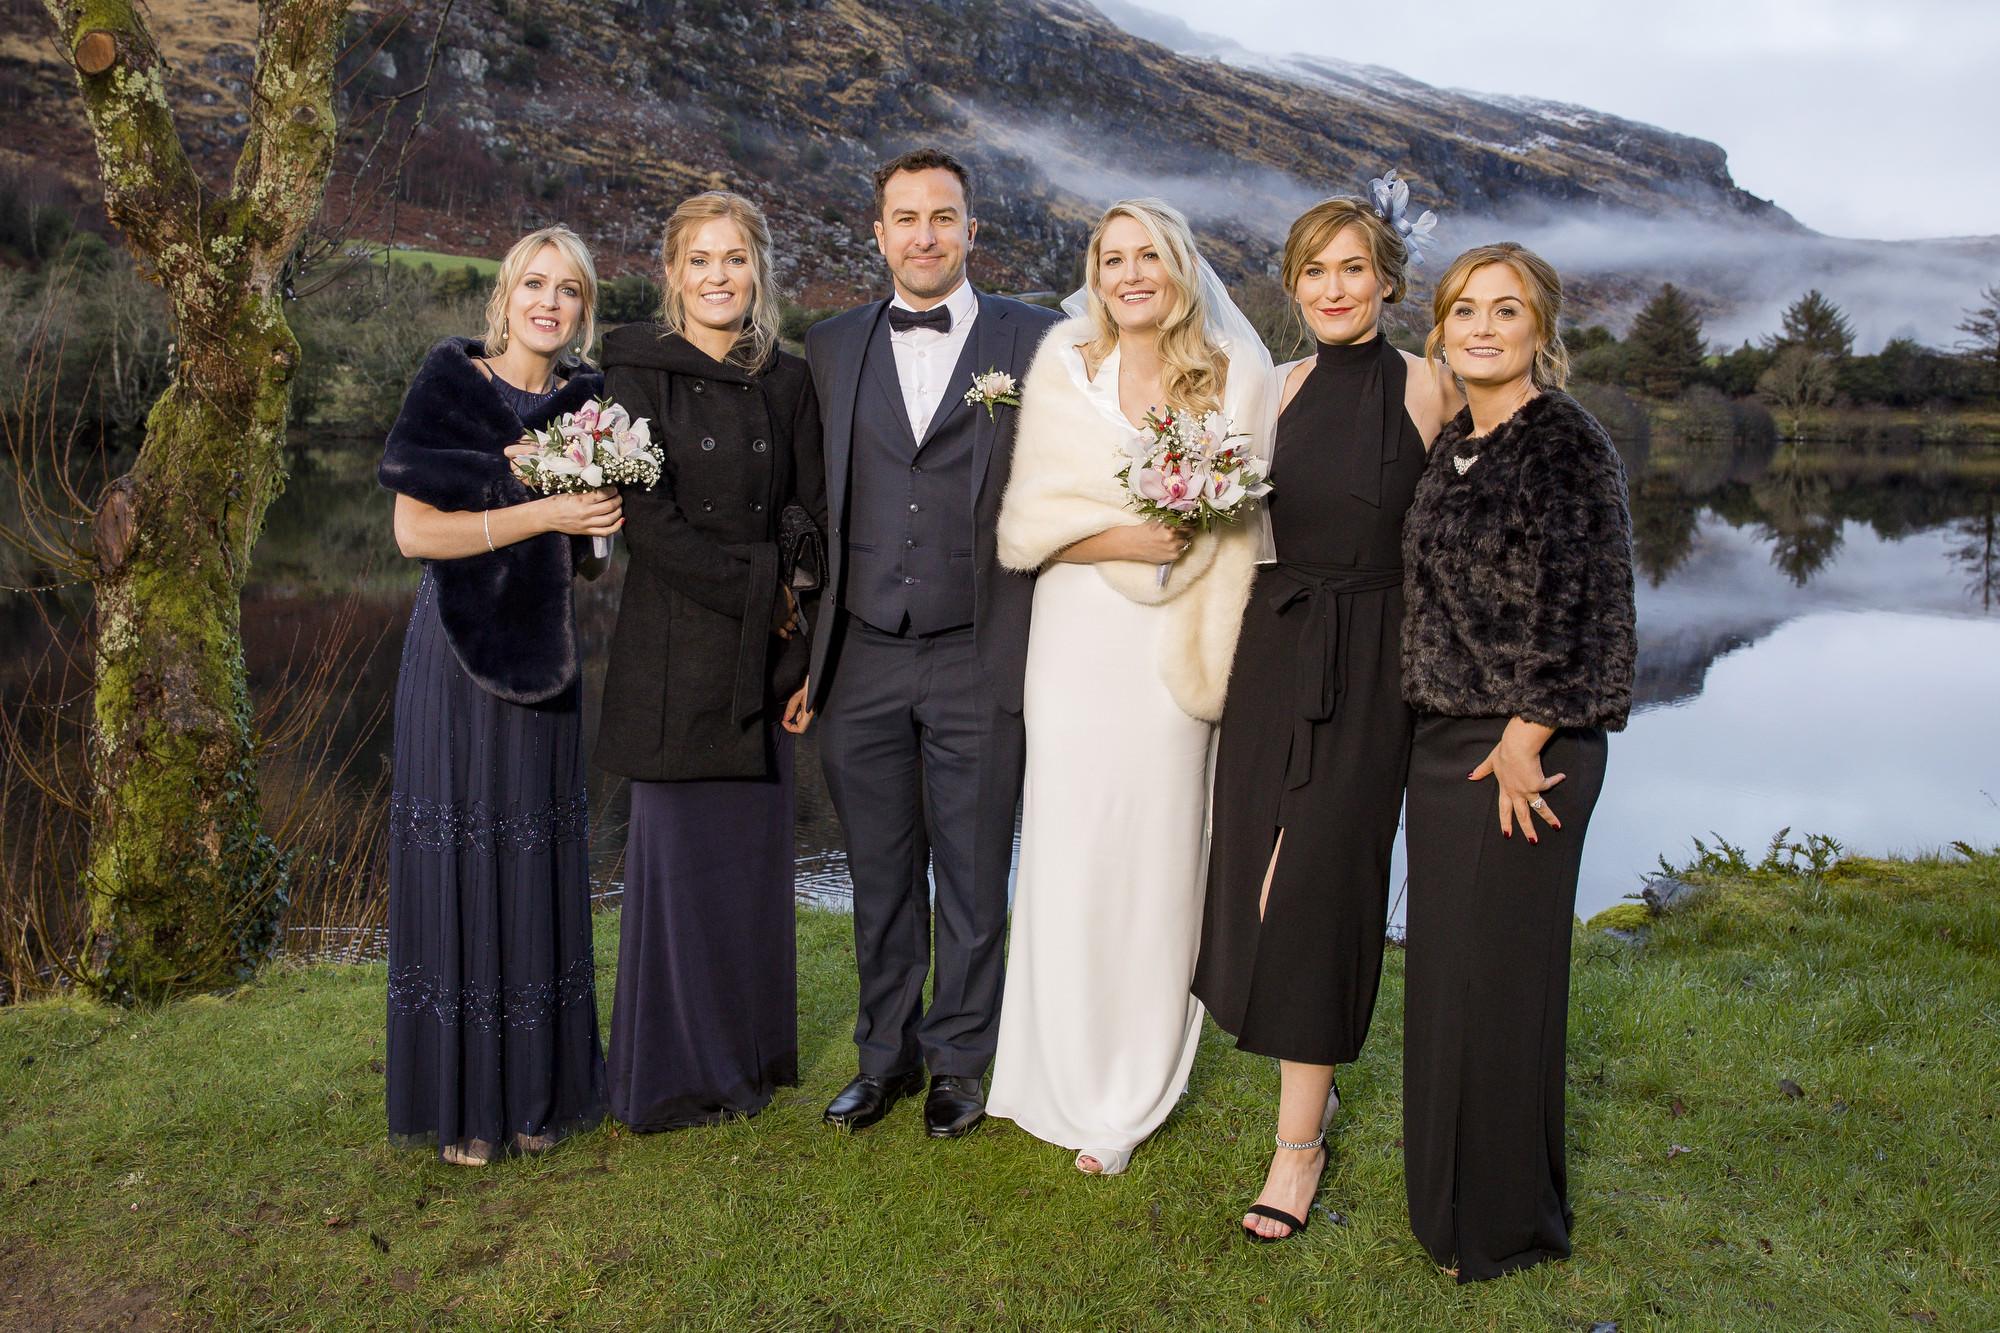 muckross_park_hotel_grougane_barra_wedding_photographer_goldenmoments_043.jpg